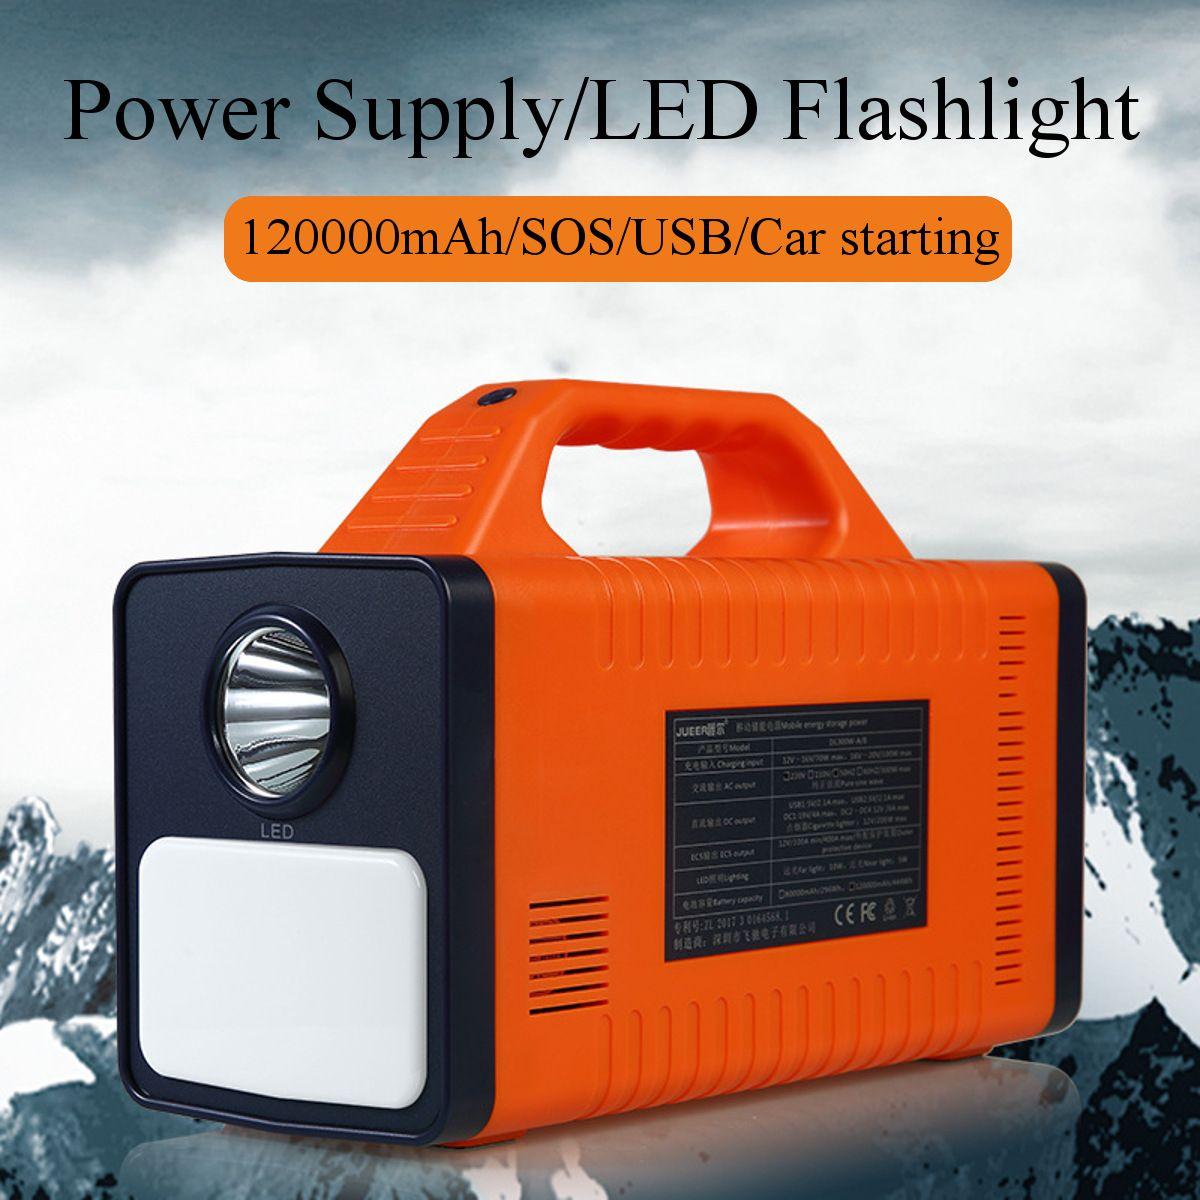 120000 mAh 444Wh 300 W Tragbare Solar Power Inverter Generator Camping Licht Auto Starthilfe Energie Lagerung Mobilen Power Versorgung